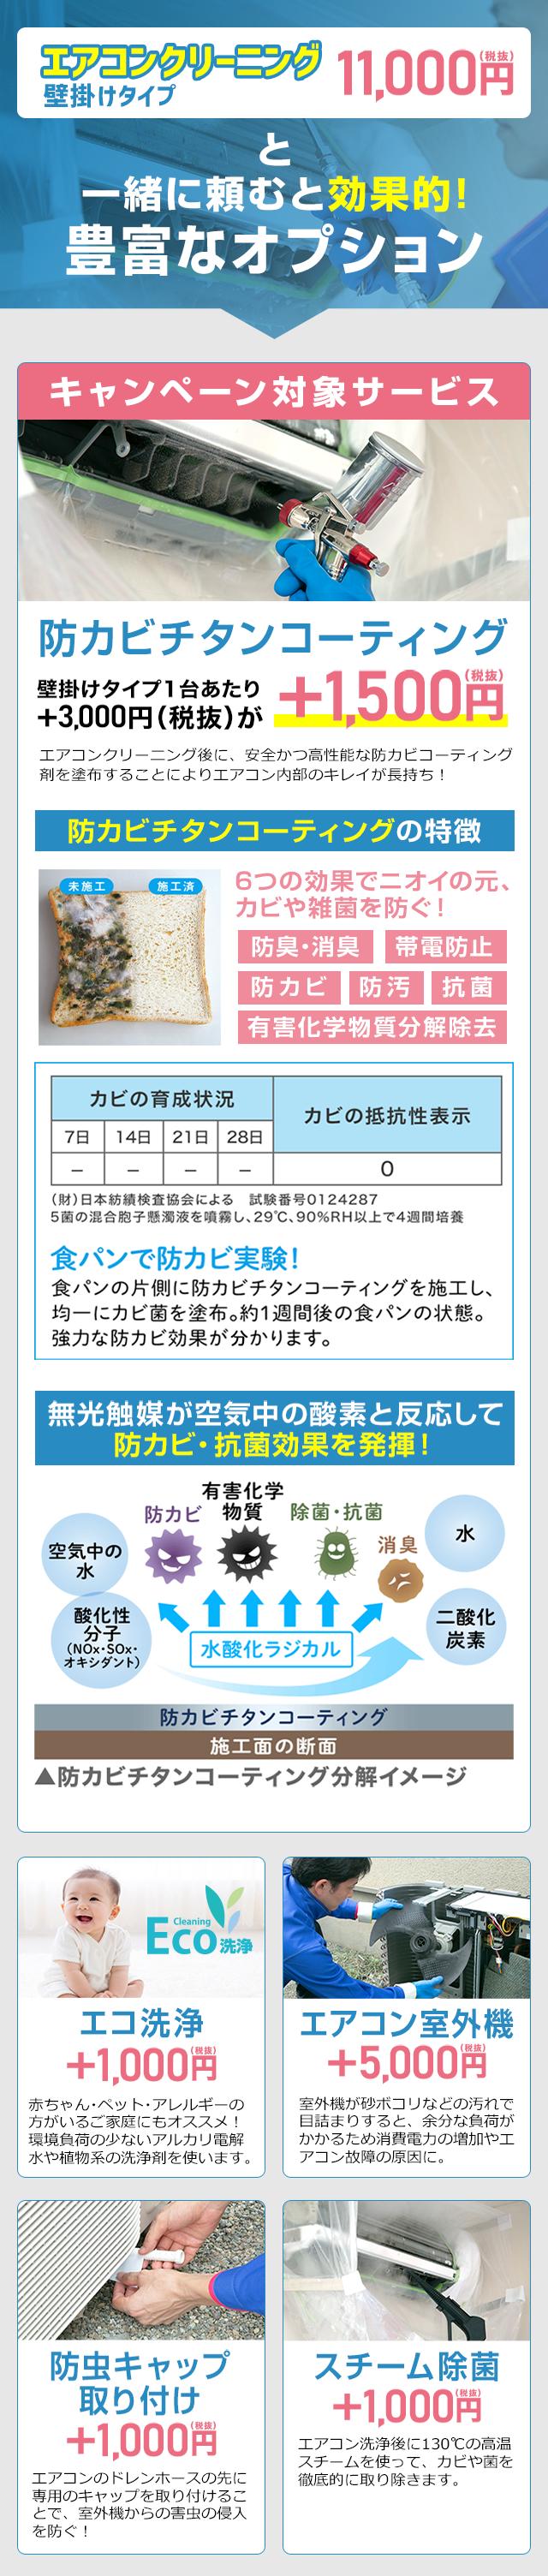 sp_20-04_02